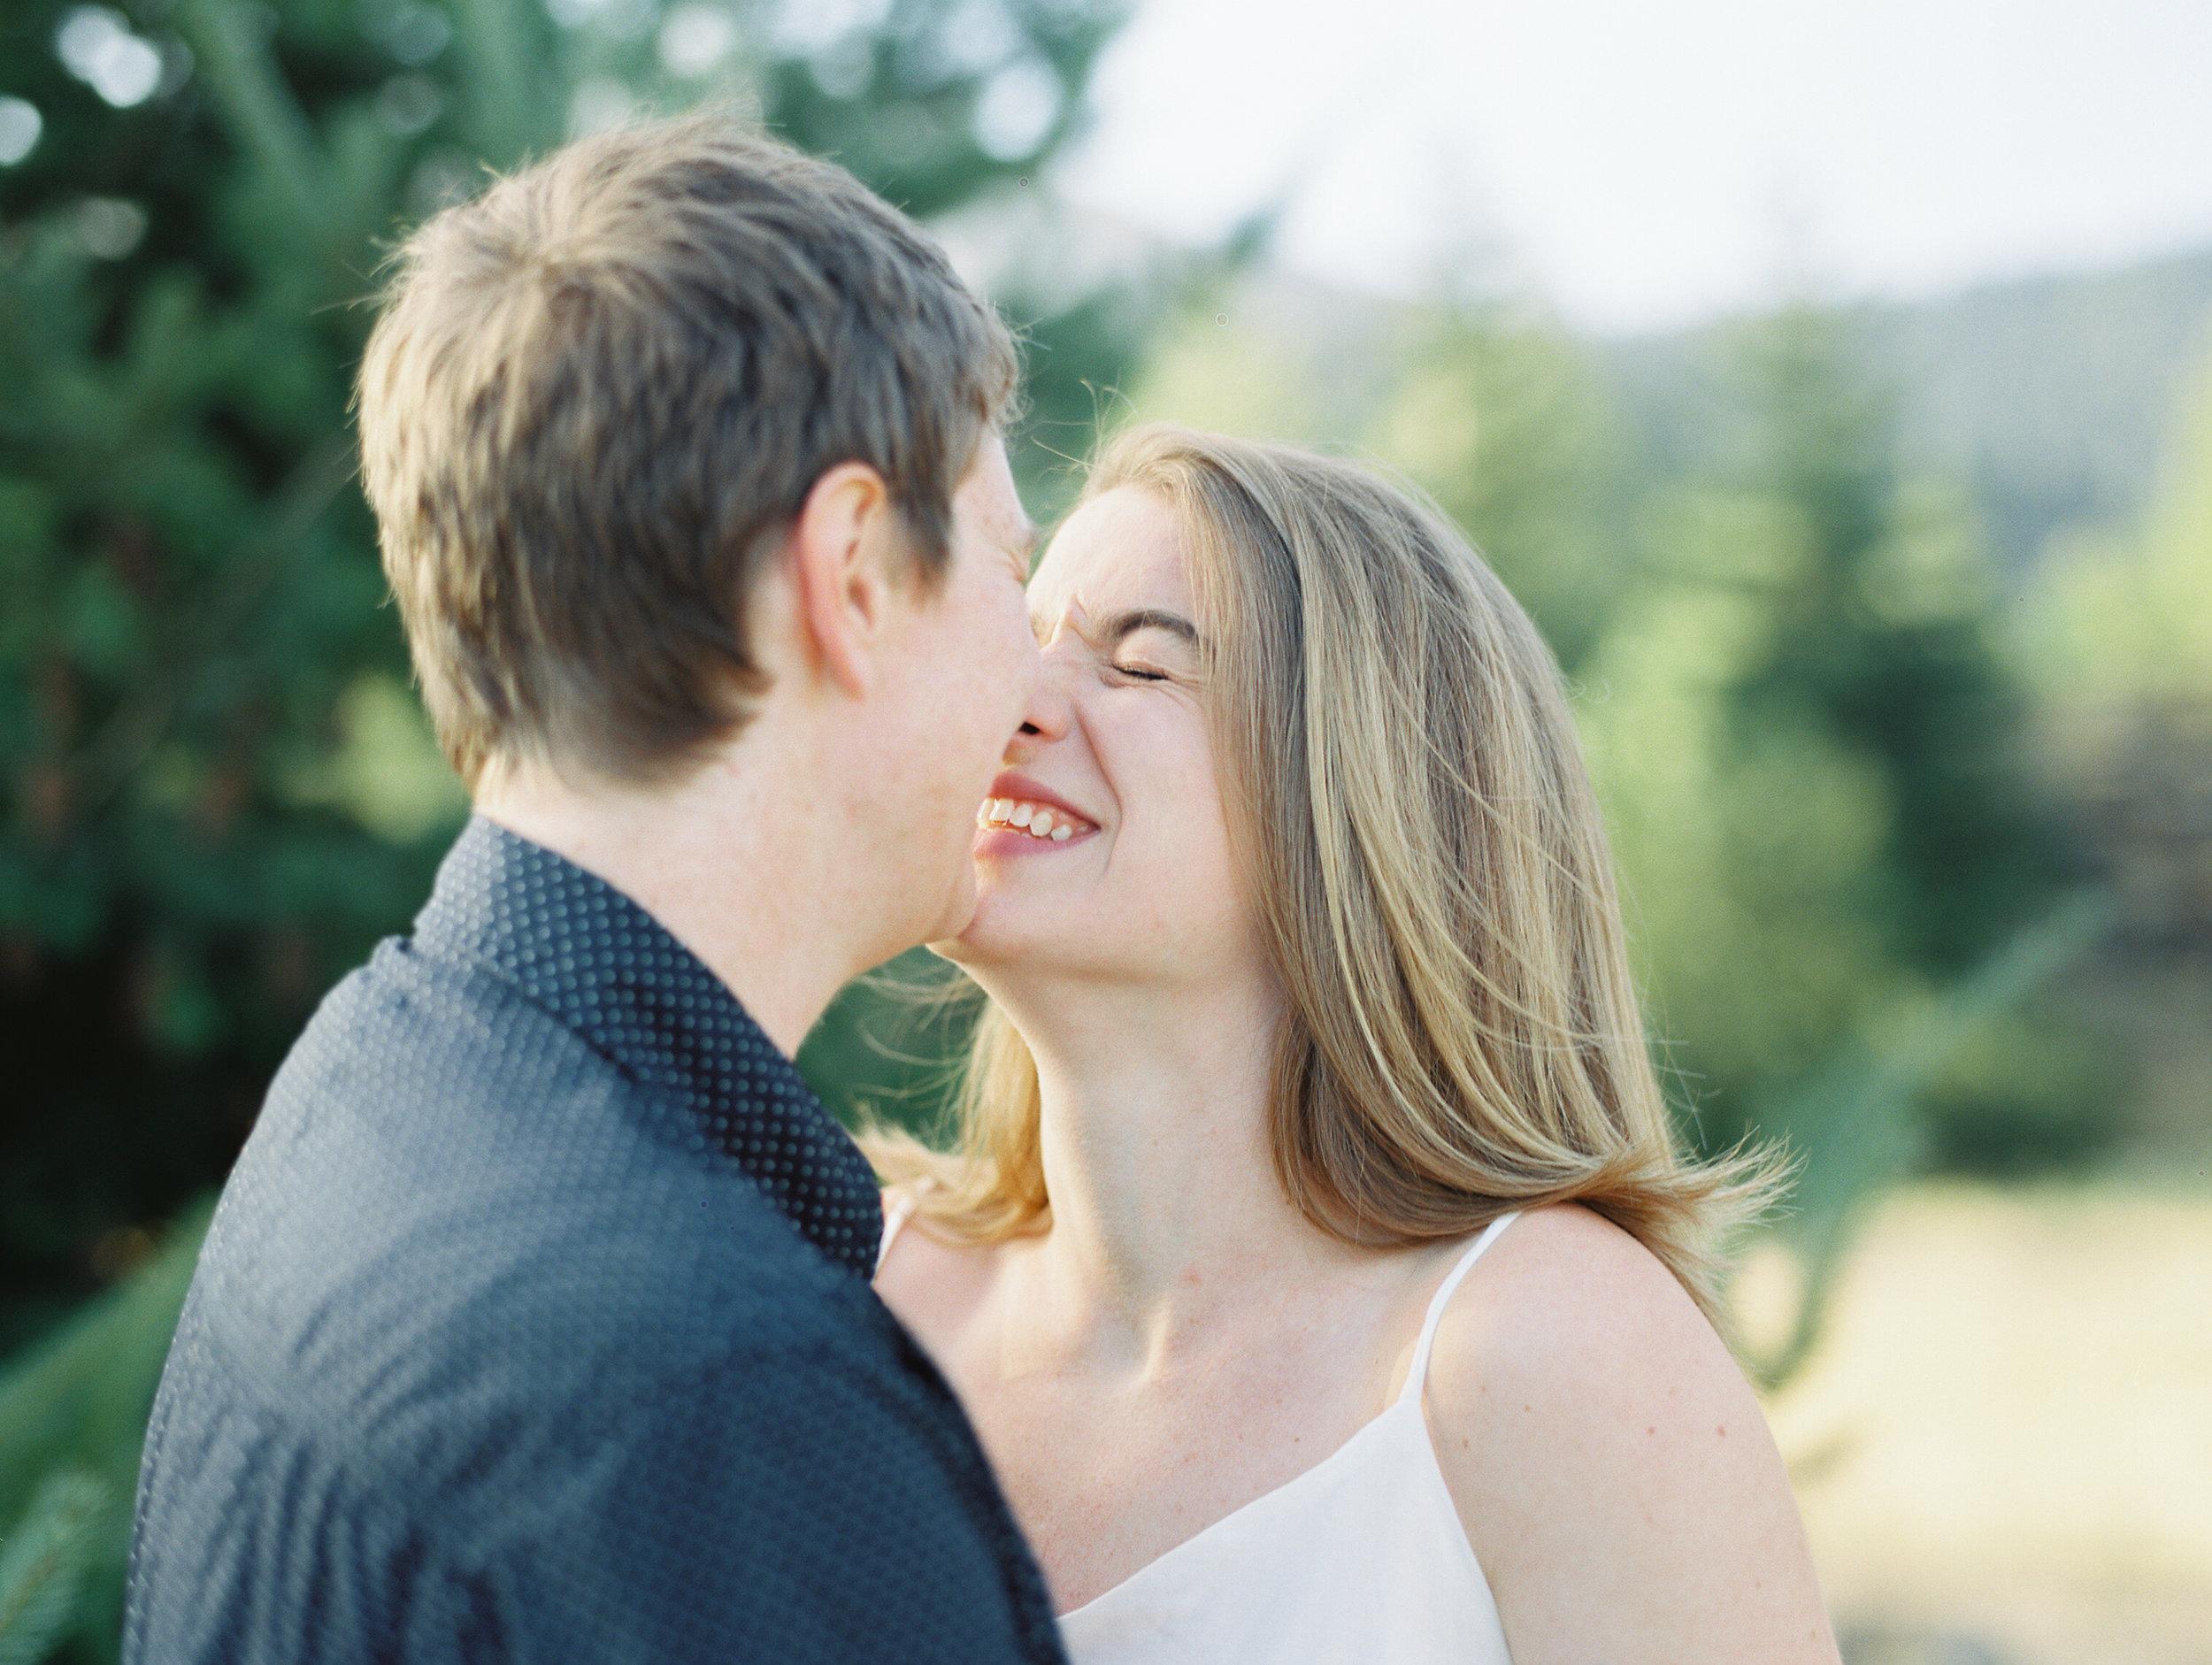 Courtney-Kendra-Govt-Cove-Engagement-11.jpg